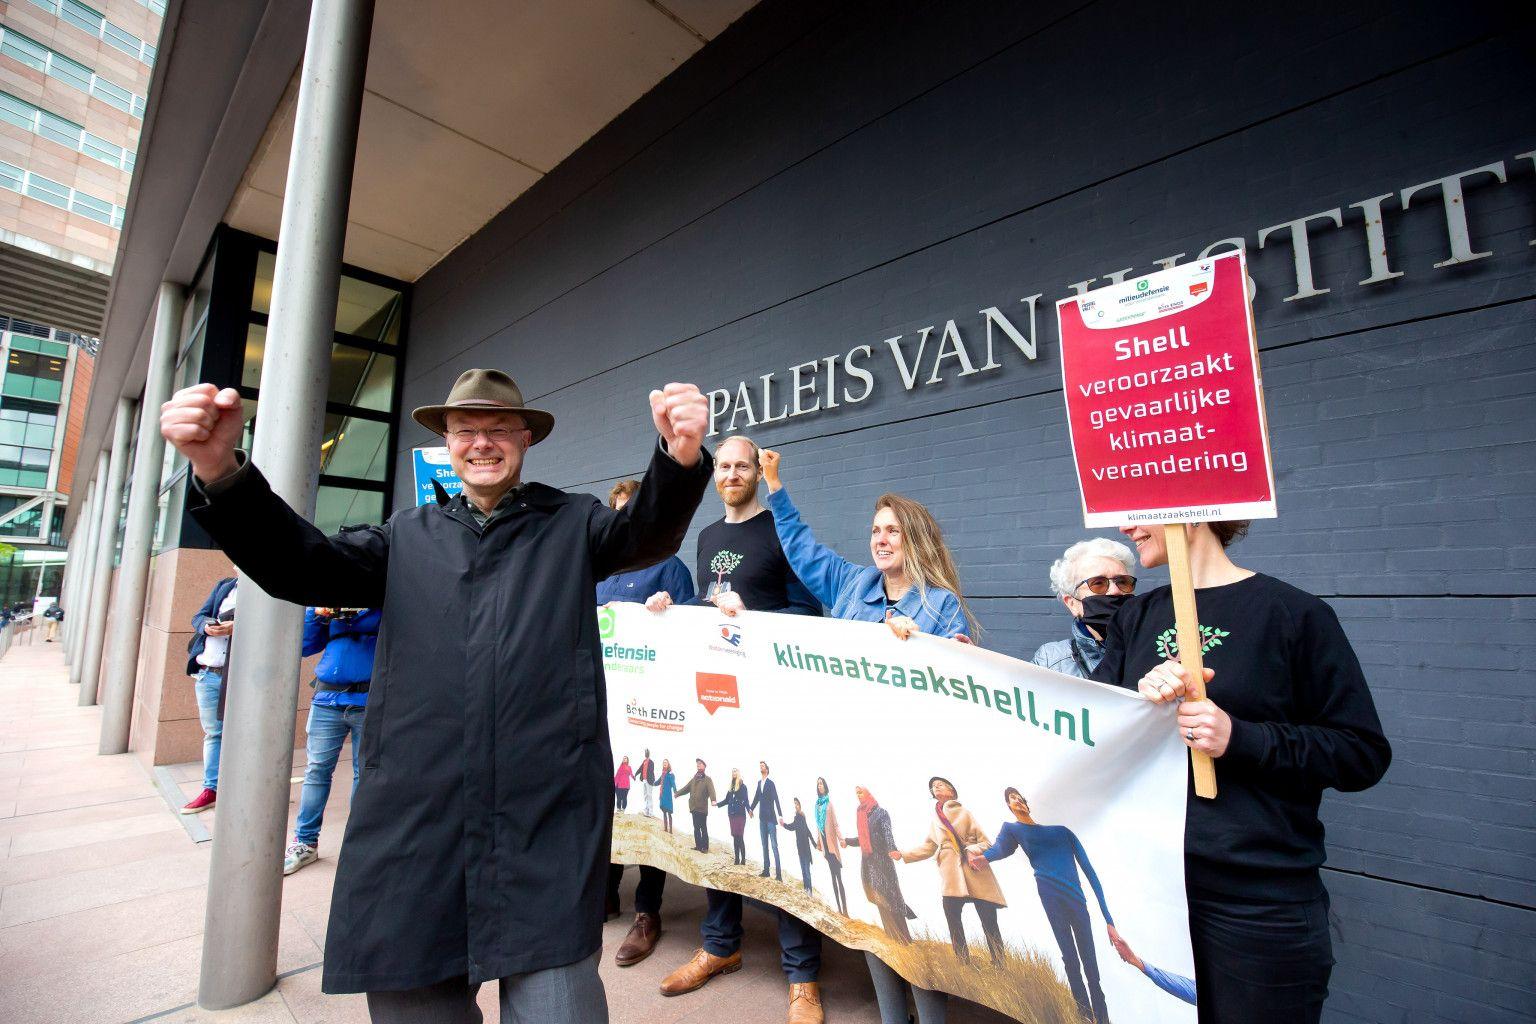 Donald Pols celebrates Dutch Climate Case victory against Shell Photo: Milieudefensie